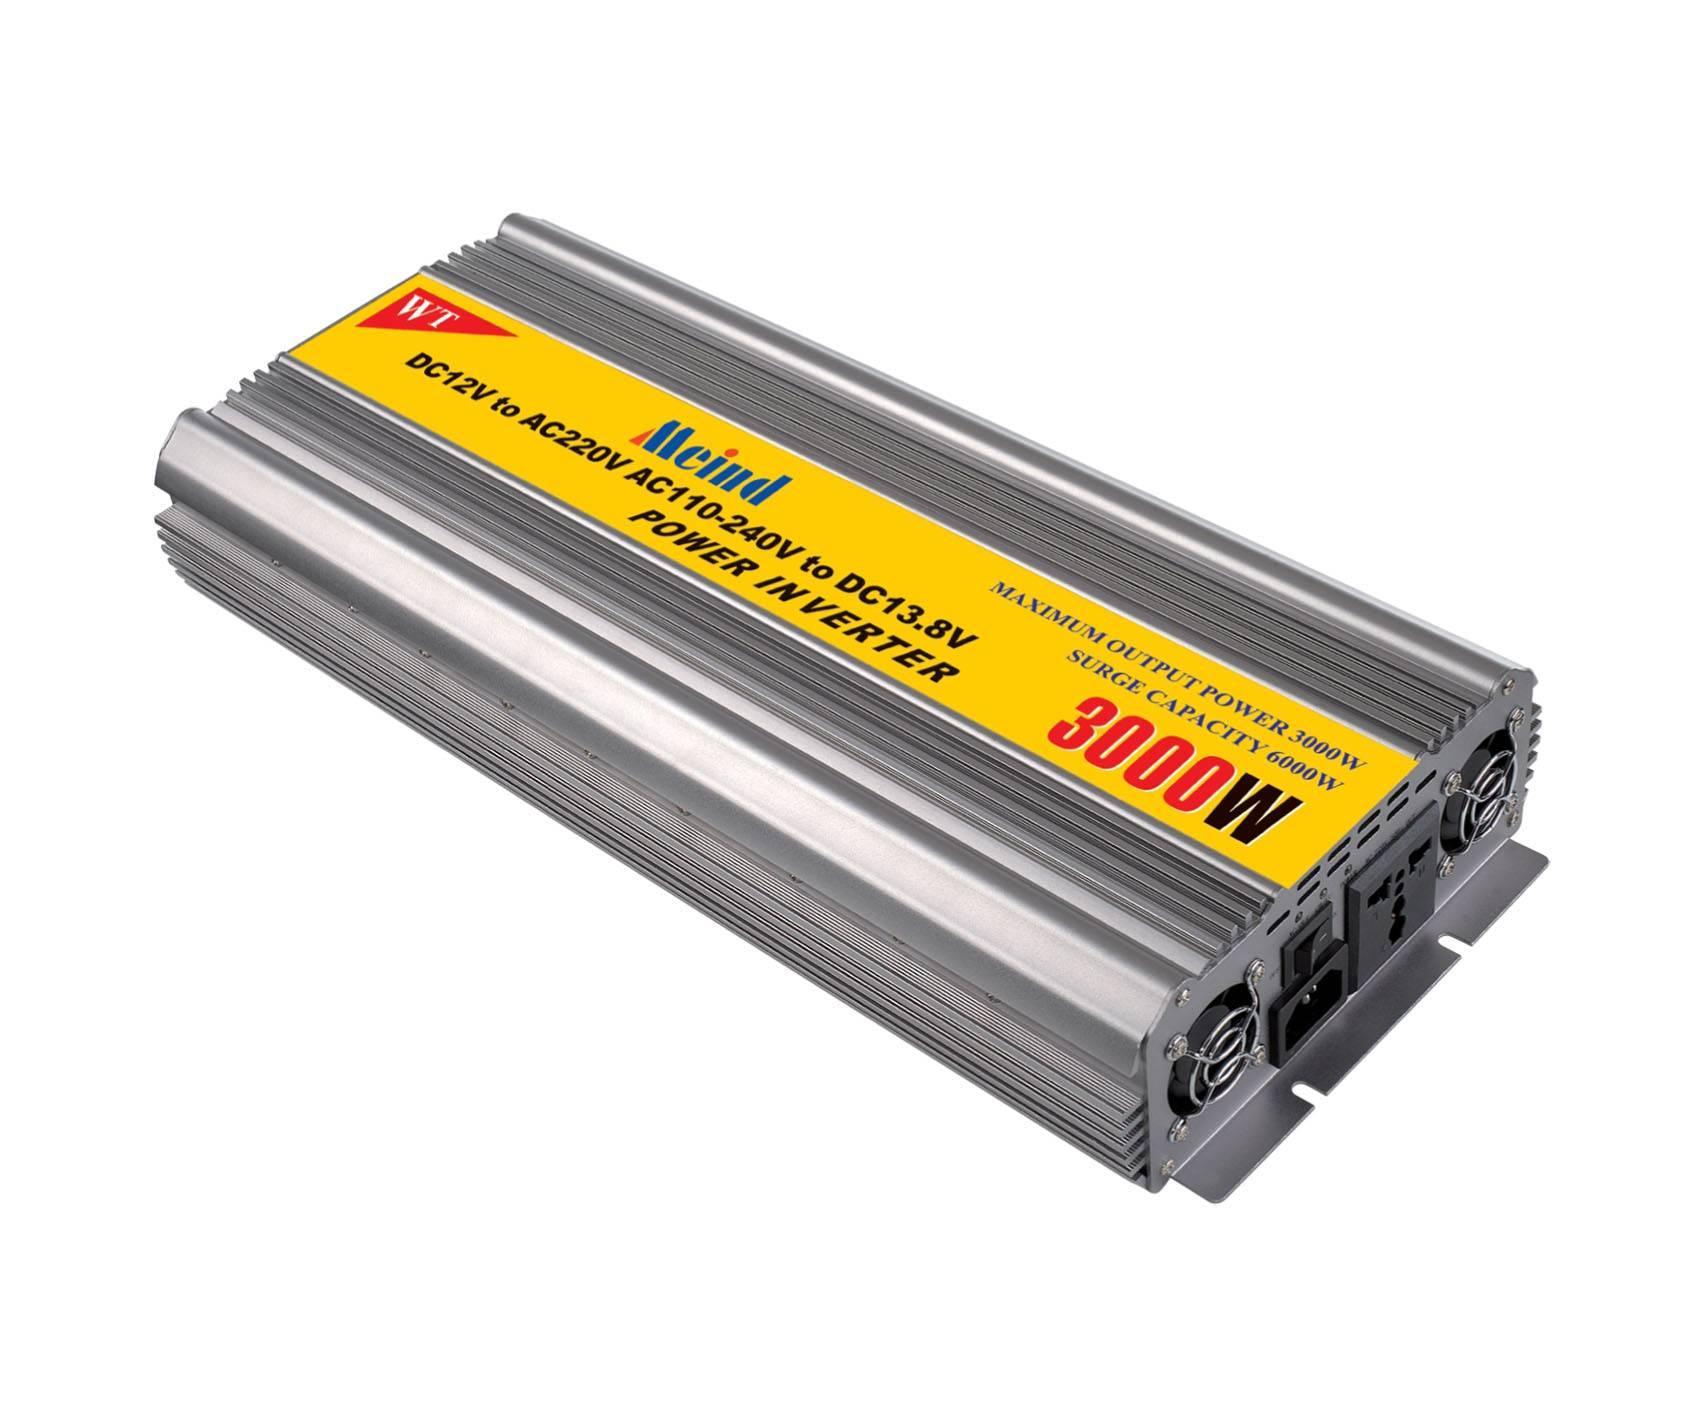 Meind DC12V/24V/36V/48V to AC100V-240V 75W-6000W Home inverter,solar inverter